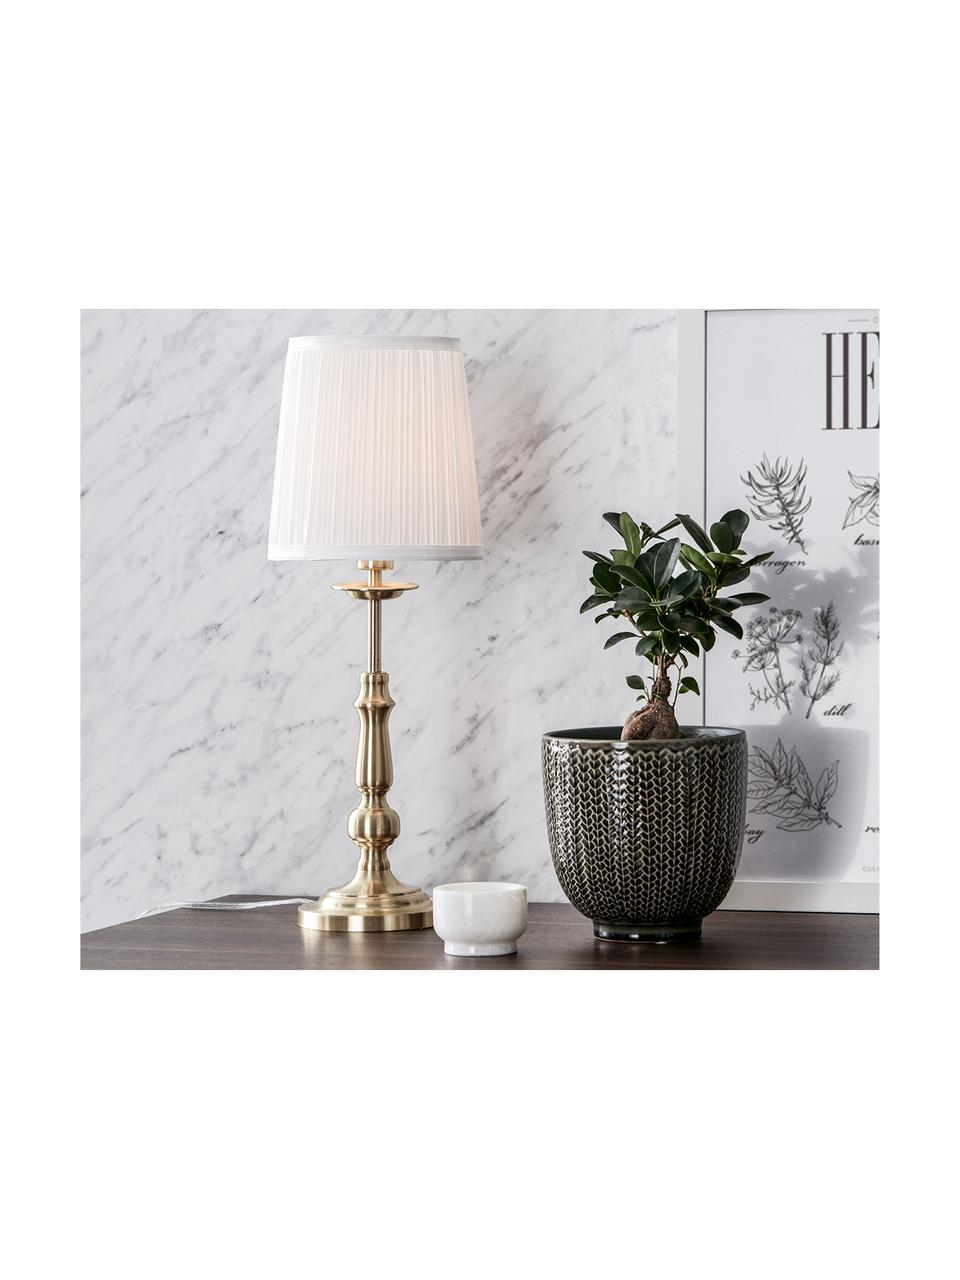 Tischlampe Imperia in Messing, Lampenschirm: Polyester, Lampenfuß: Metall, vermessingt, Weiß,Messing, Ø 18 x H 49 cm